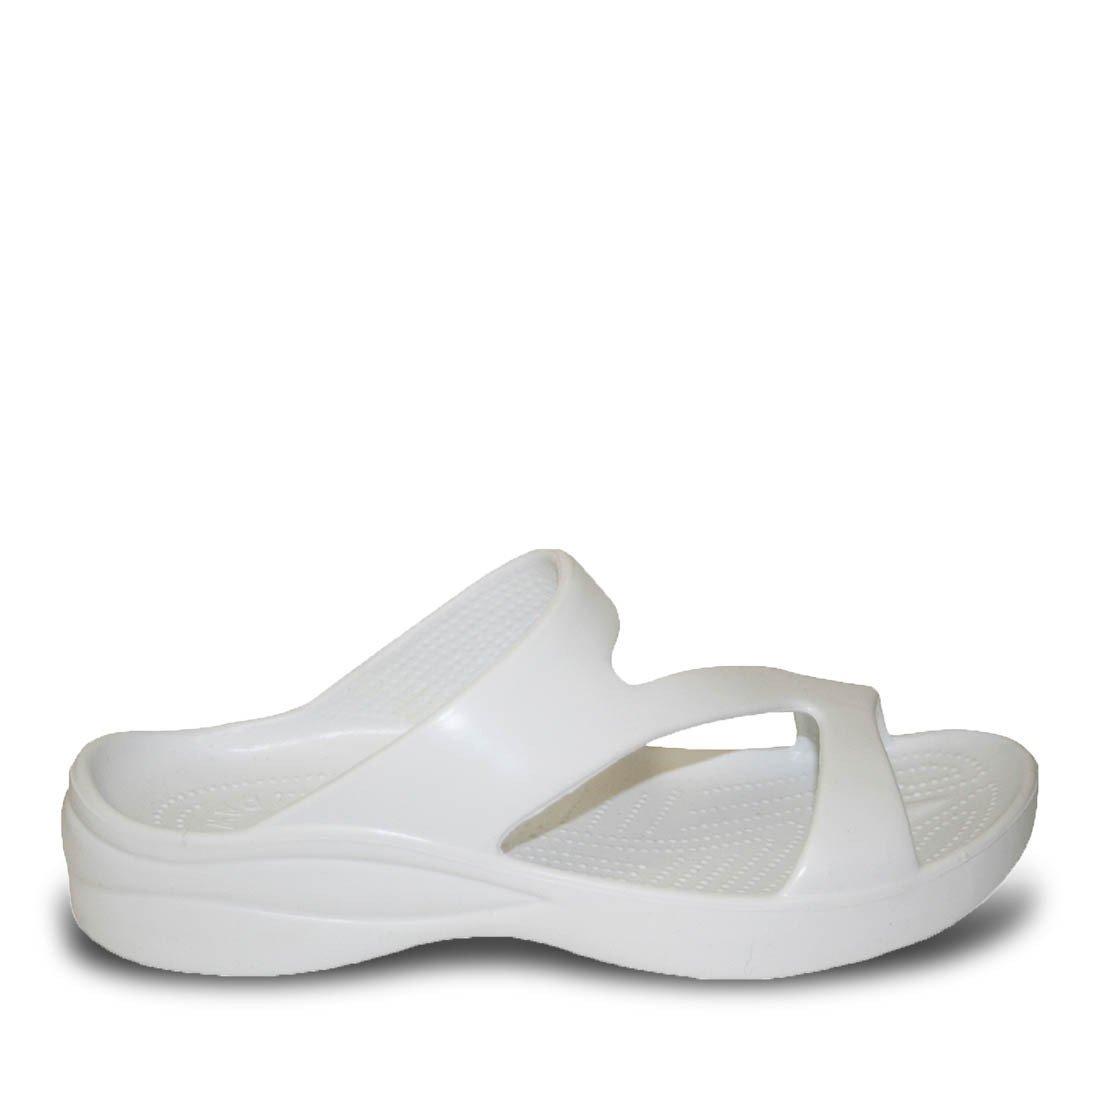 Image of Women's Z Sandals - White